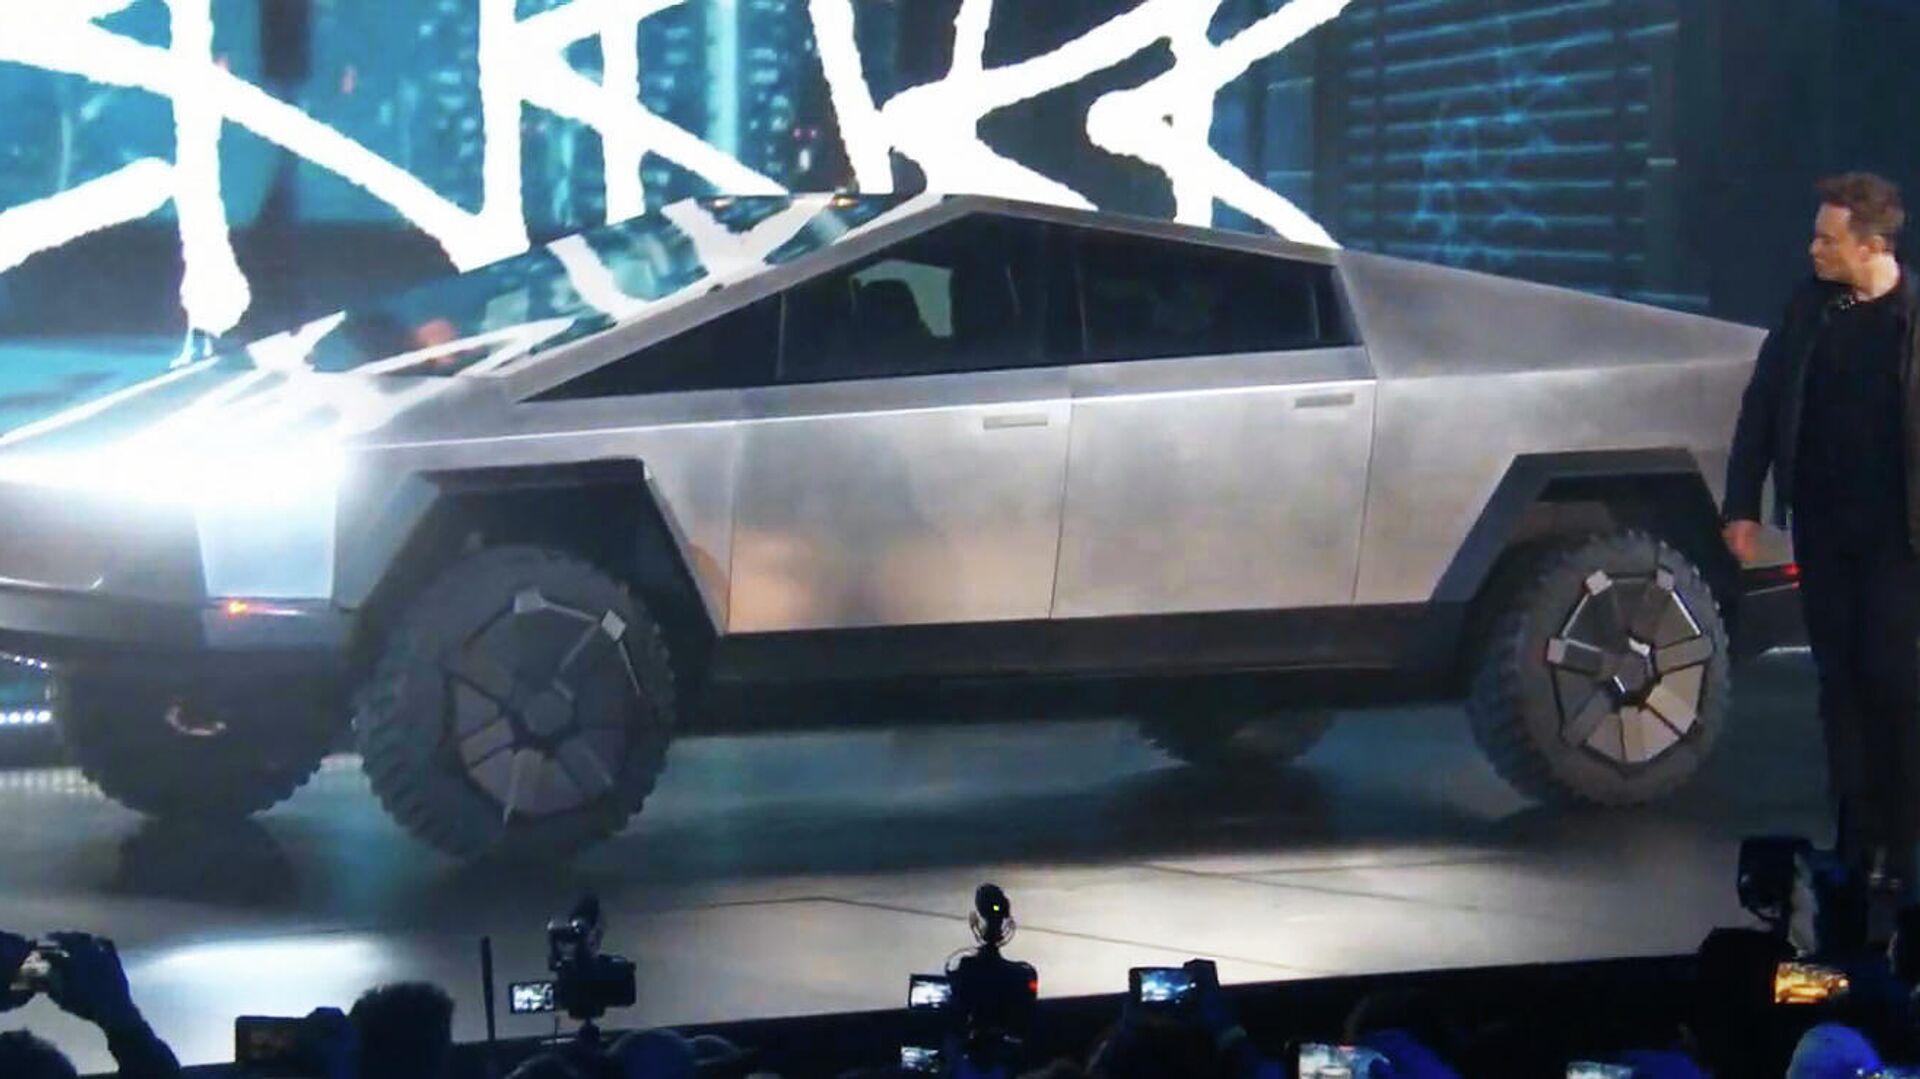 Презентация автомобиля Tesla Cybertruck - РИА Новости, 1920, 23.09.2020